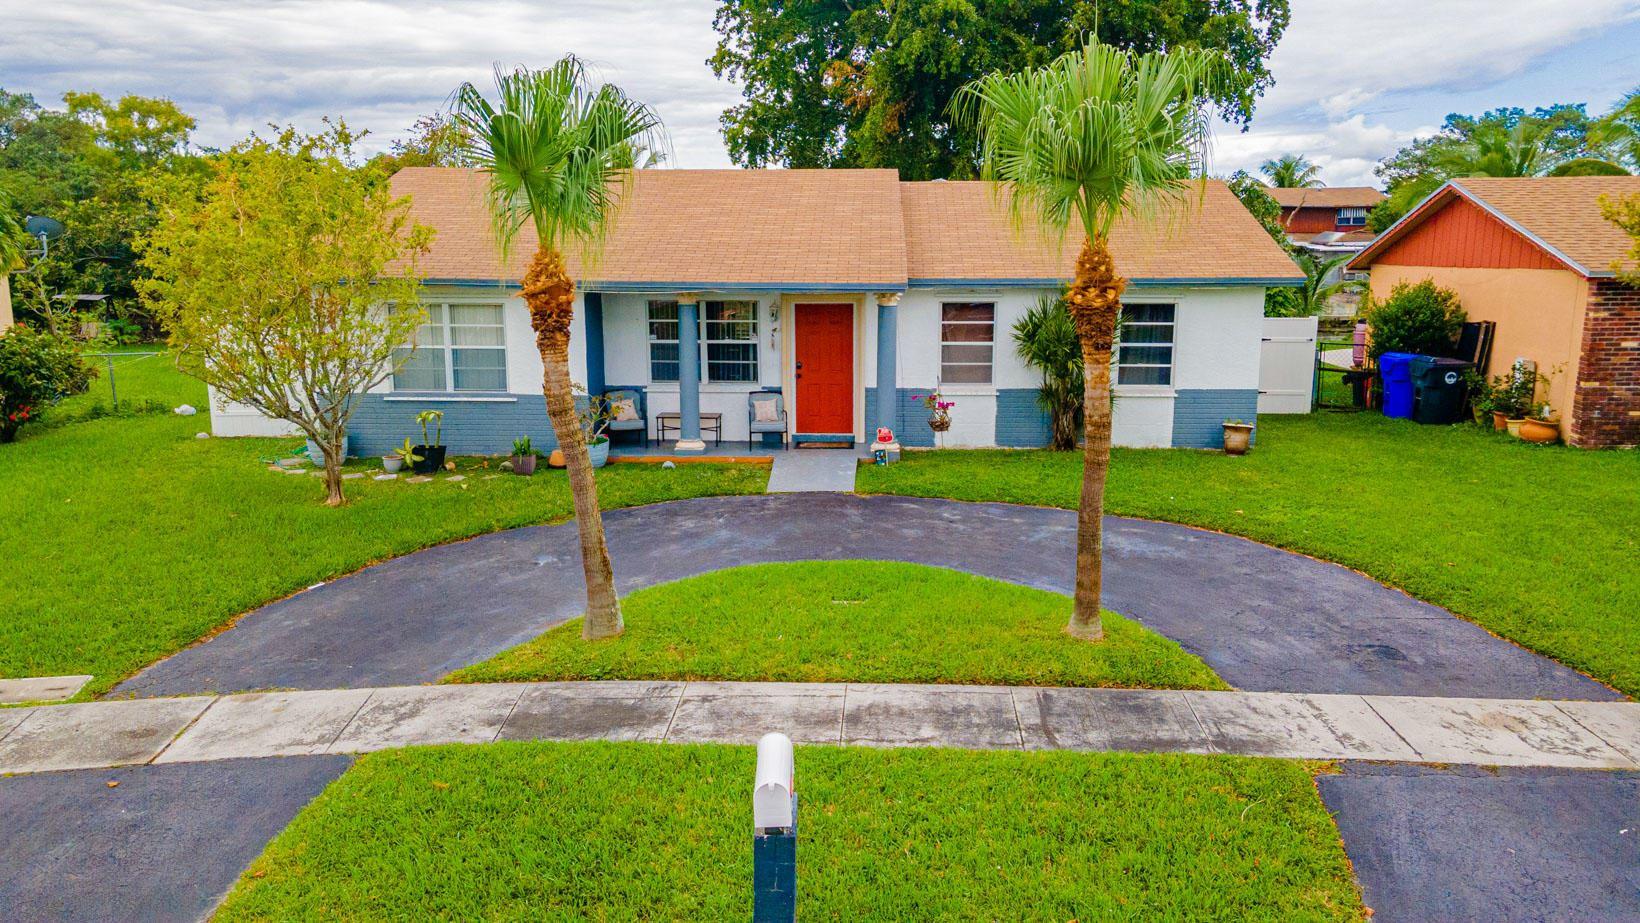 707 SW 79 Avenue, North Lauderdale, FL 33068 - #: RX-10671151